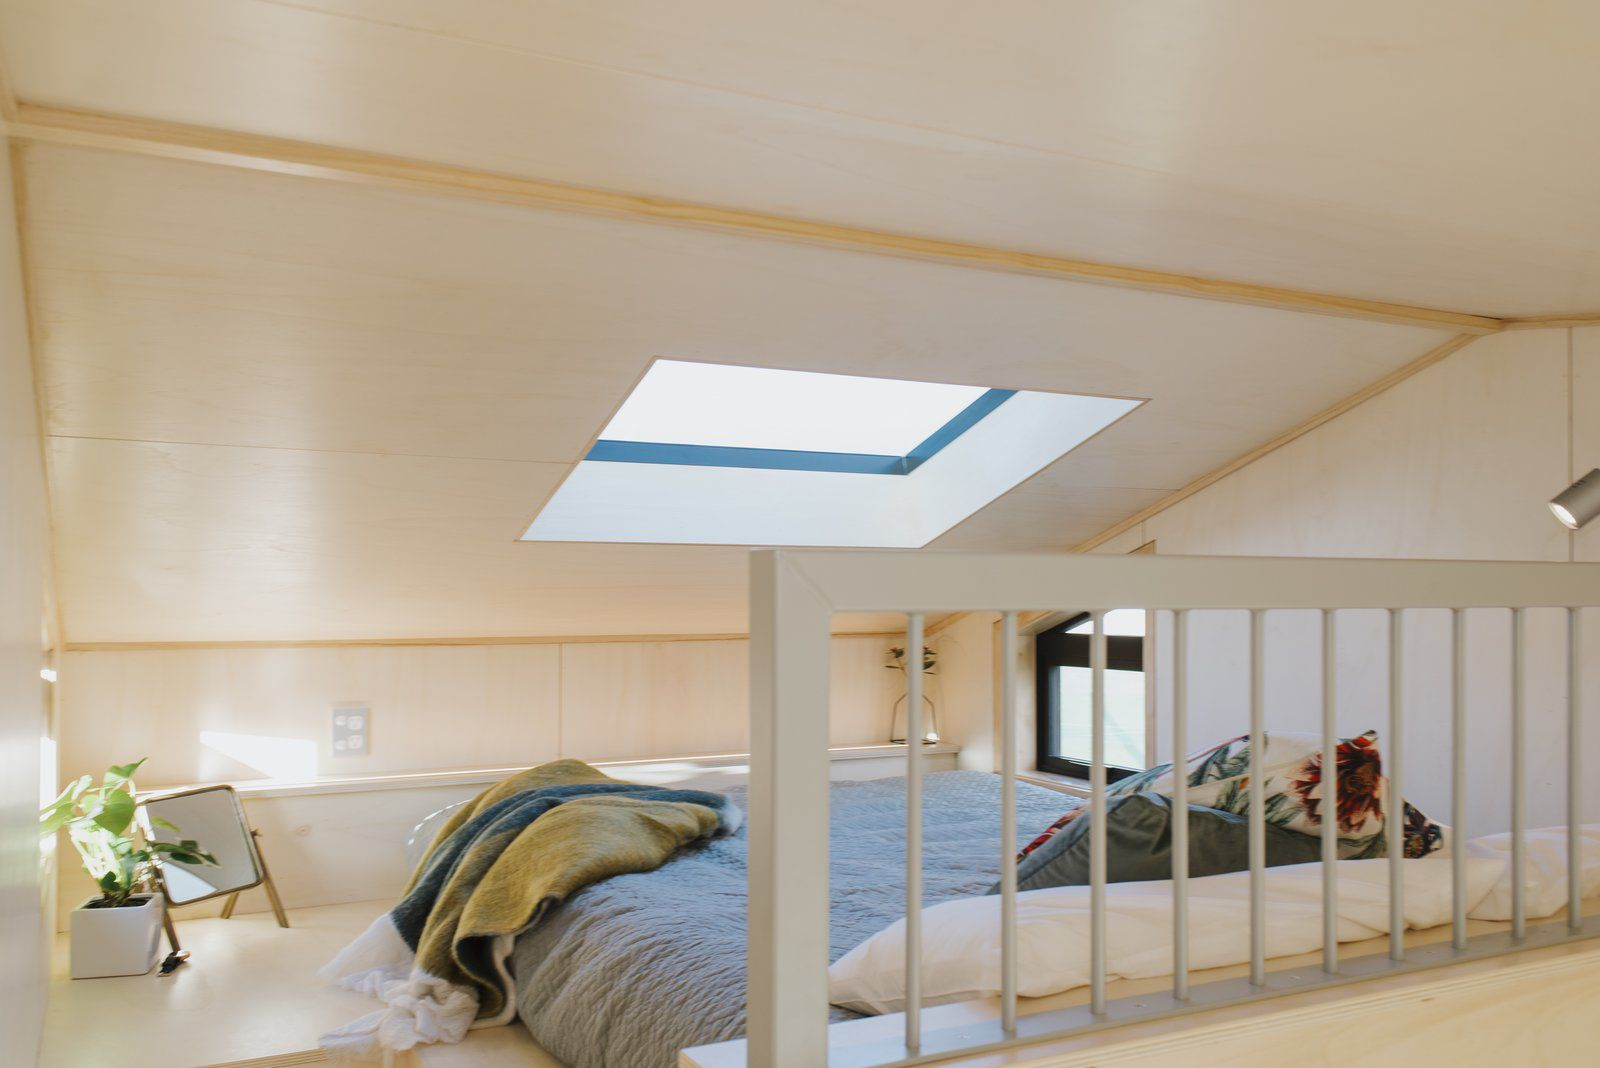 Ohariu tiny house by First Light Studio and Build Tiny bedroom